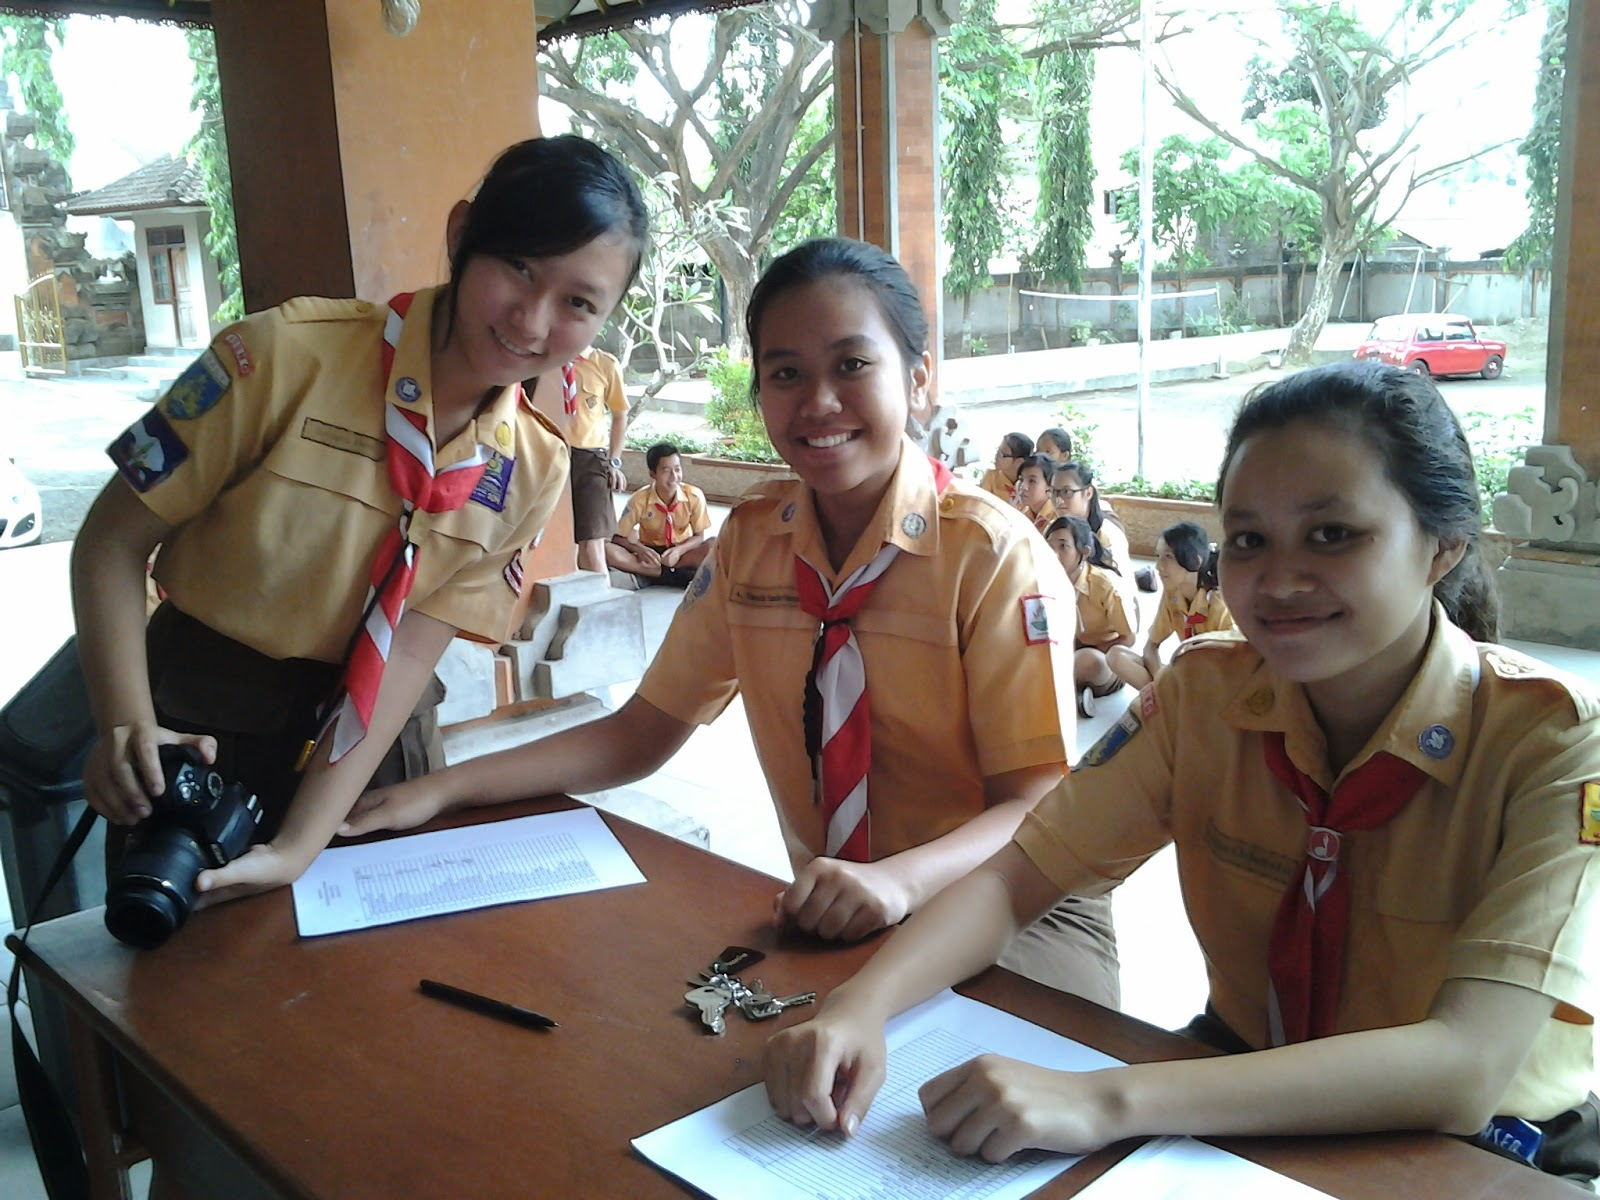 Program Kerja Osis Bidang Olahraga Lari Cepat Accountingpolv Produk Ukm Bumn Bahan Songket Sulam Katun Merah Contoh Smk